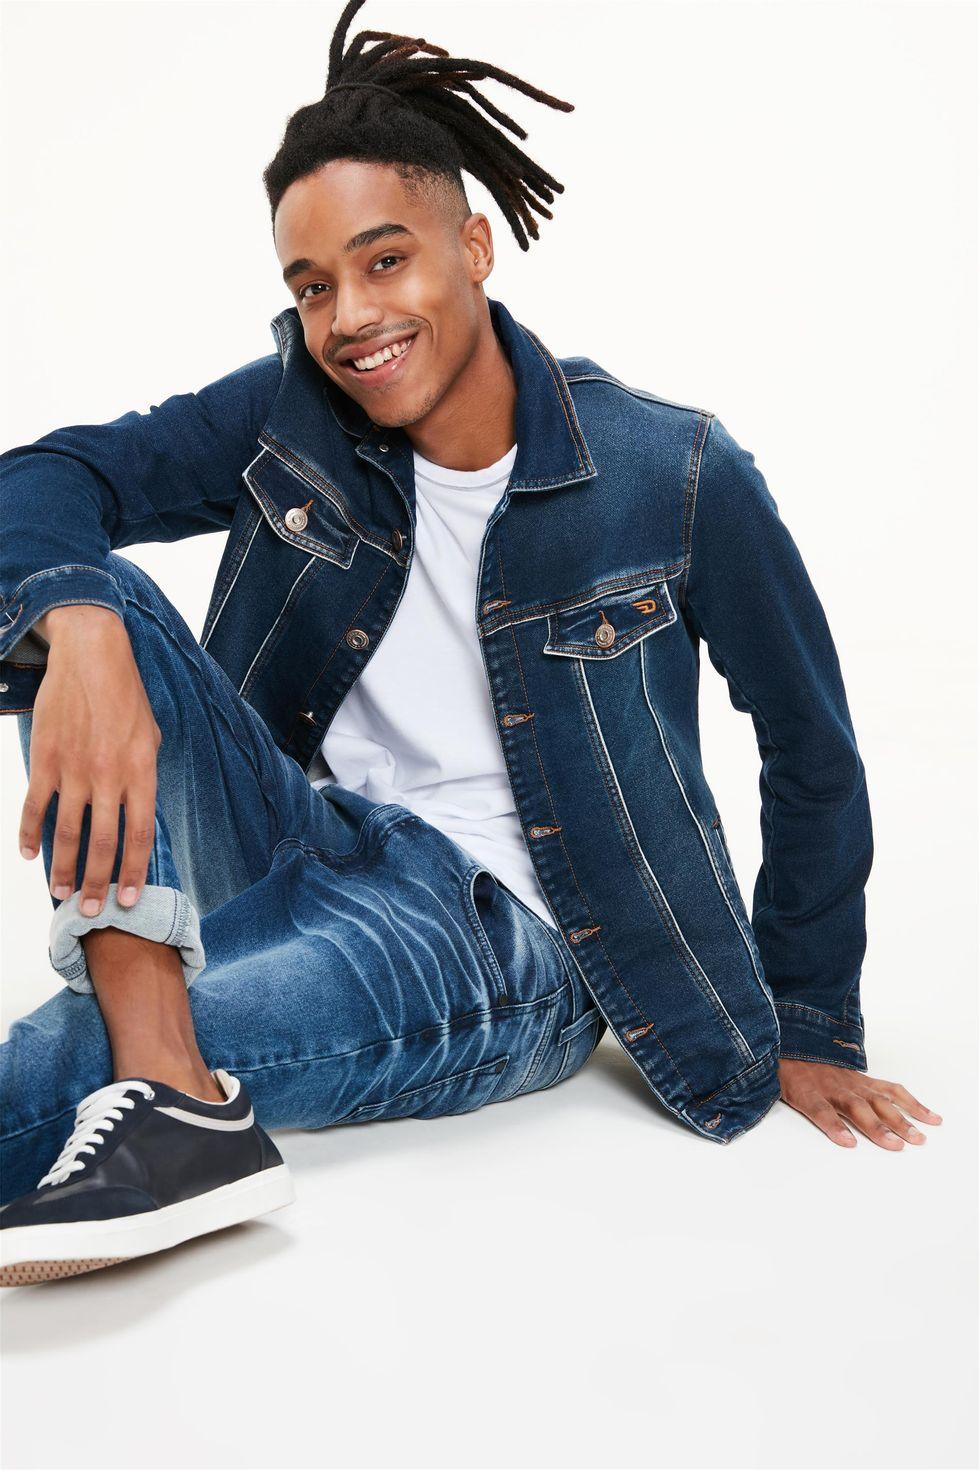 Jaqueta-Jeans-Trucker-Edicao-Especial-Frente--